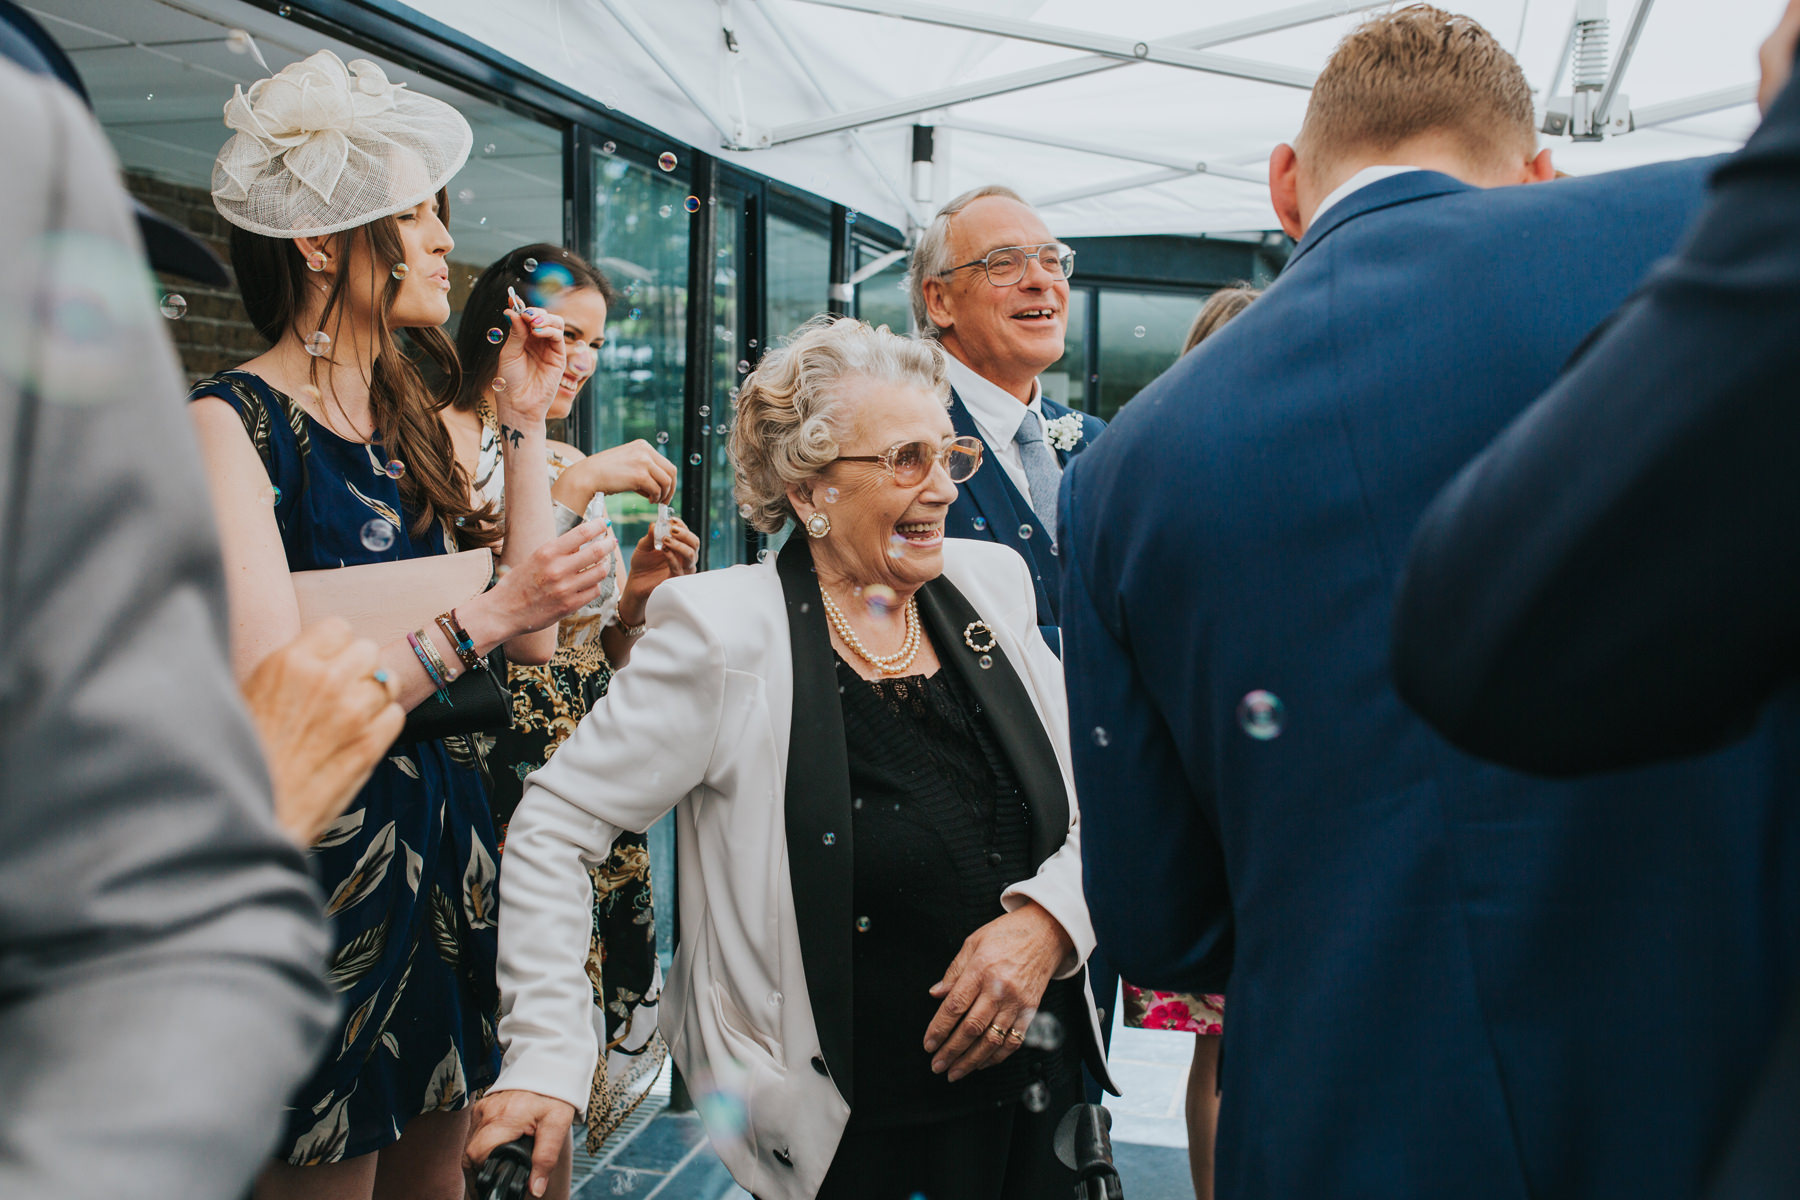 CRL-230-The Bingham Wedding Richmond-groom bride guests blowing bubbles.jpg